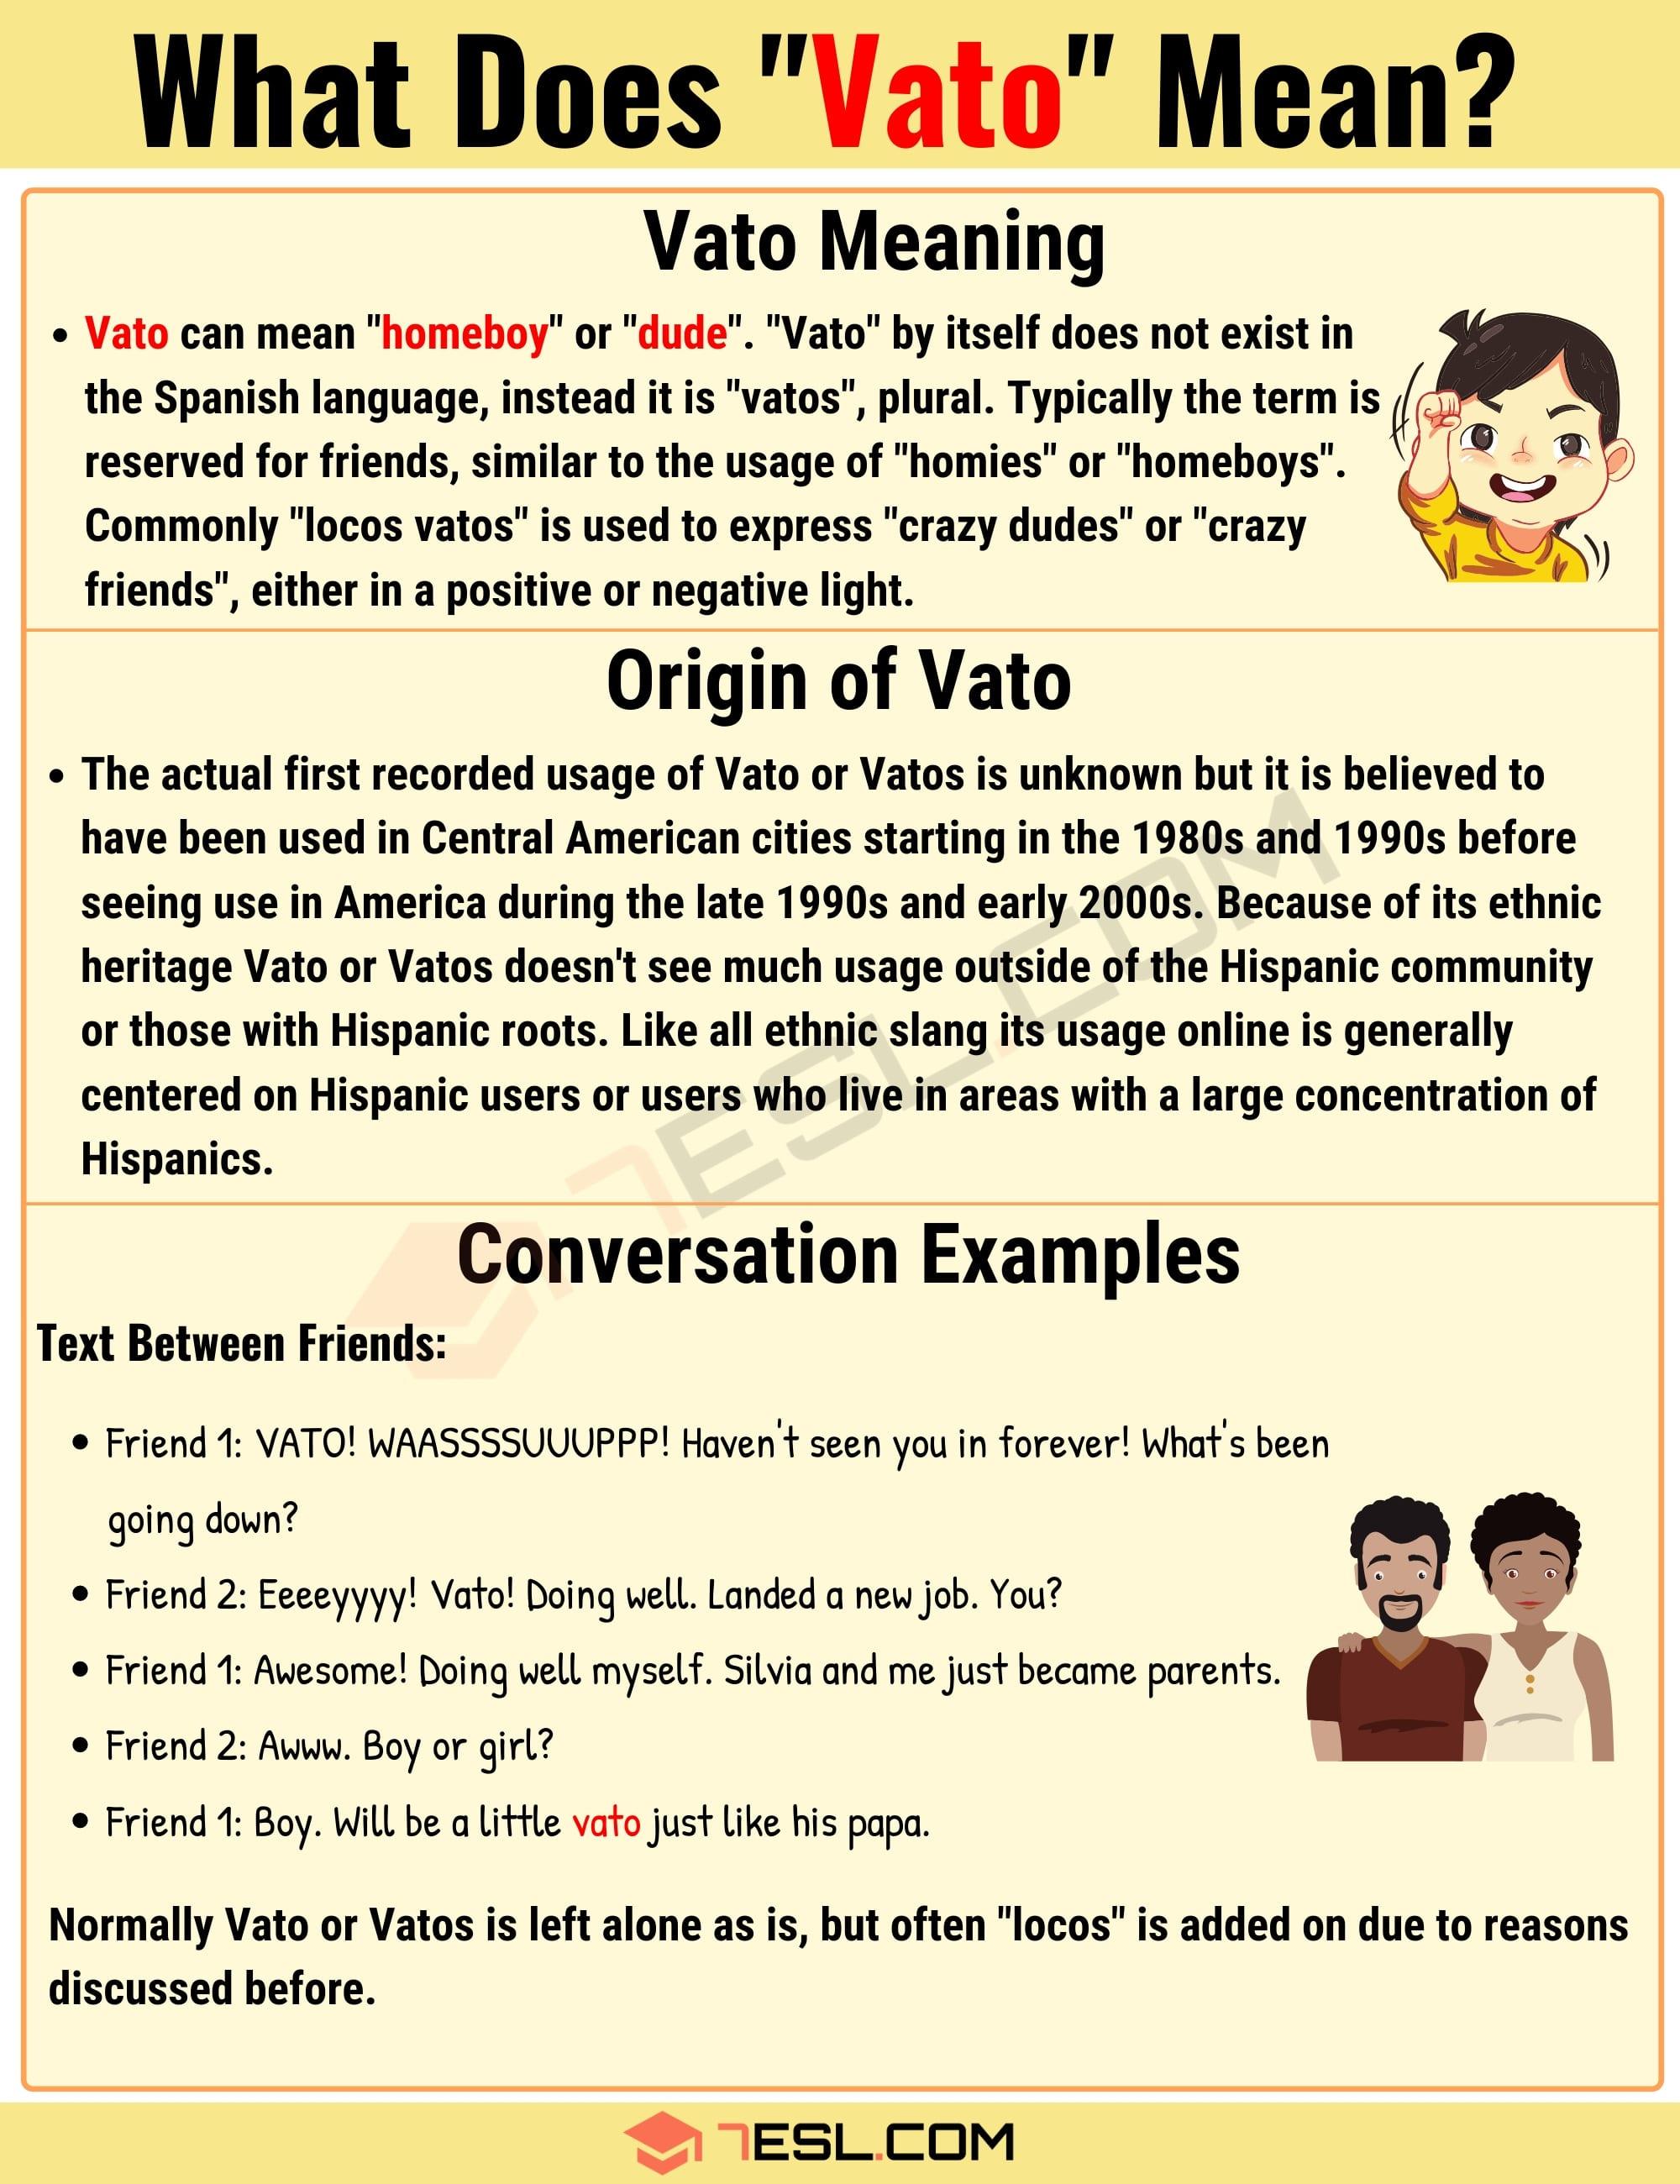 Sayhi chat love meet dating quiz